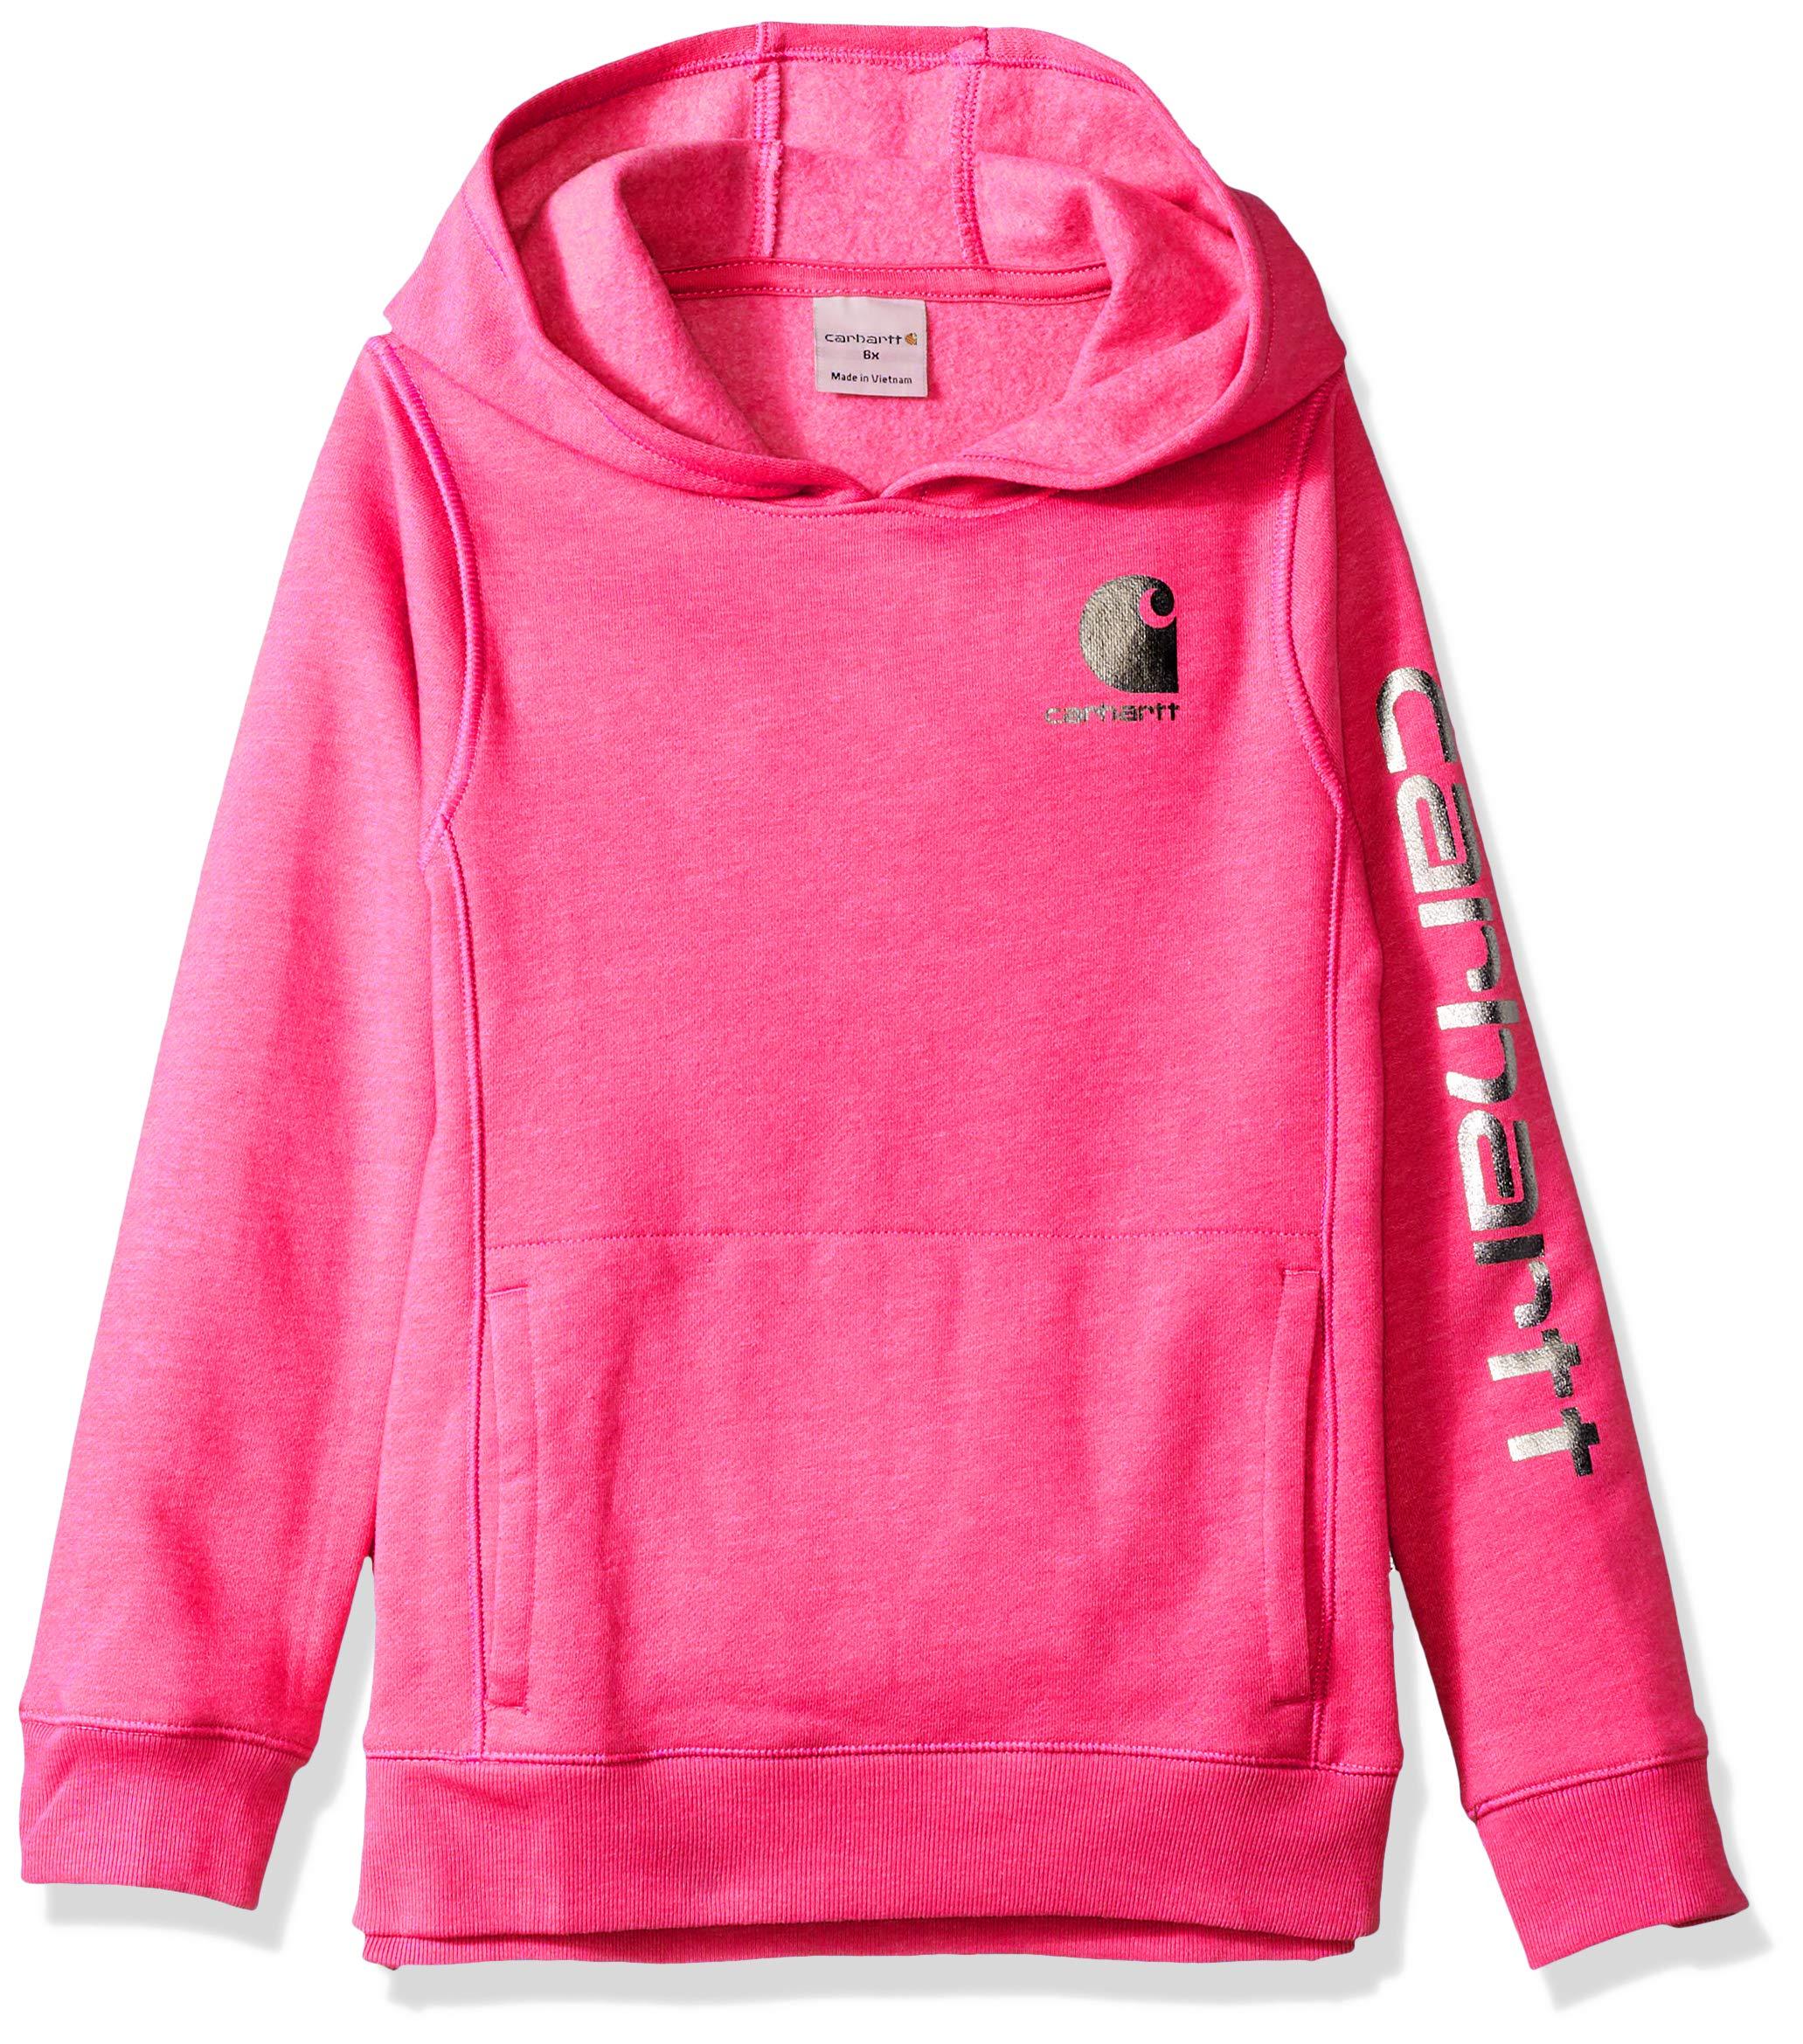 Carhartt Little Girls' Long Sleeve Sweatshirt, Fuchsia Purple Heather, 5